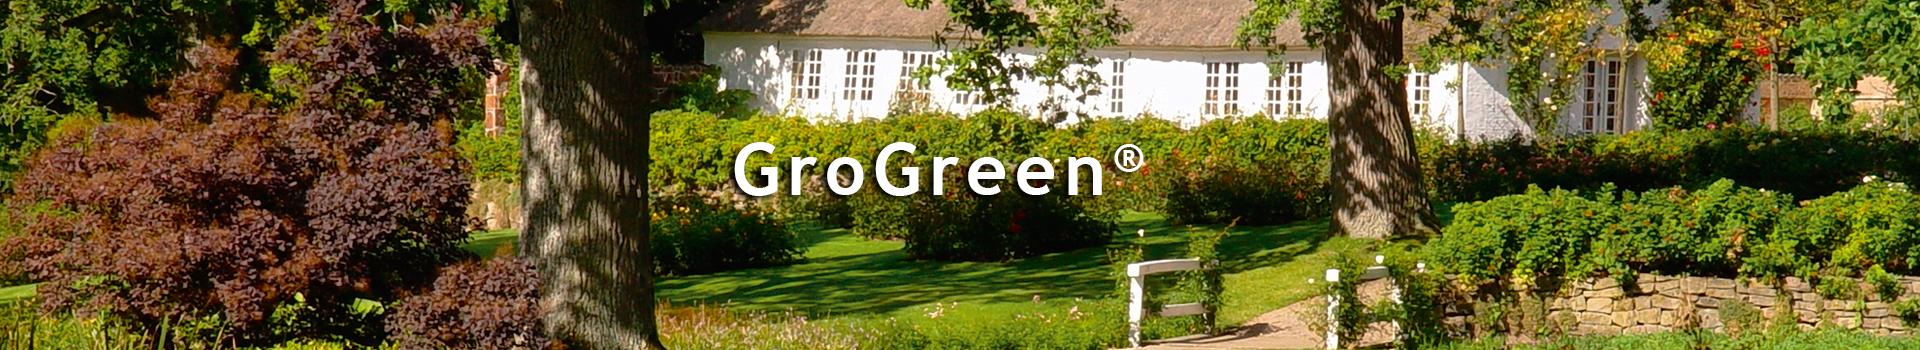 GroGreen<sup>®</sup> Feed & Shine<sup>®</sup> Buxus